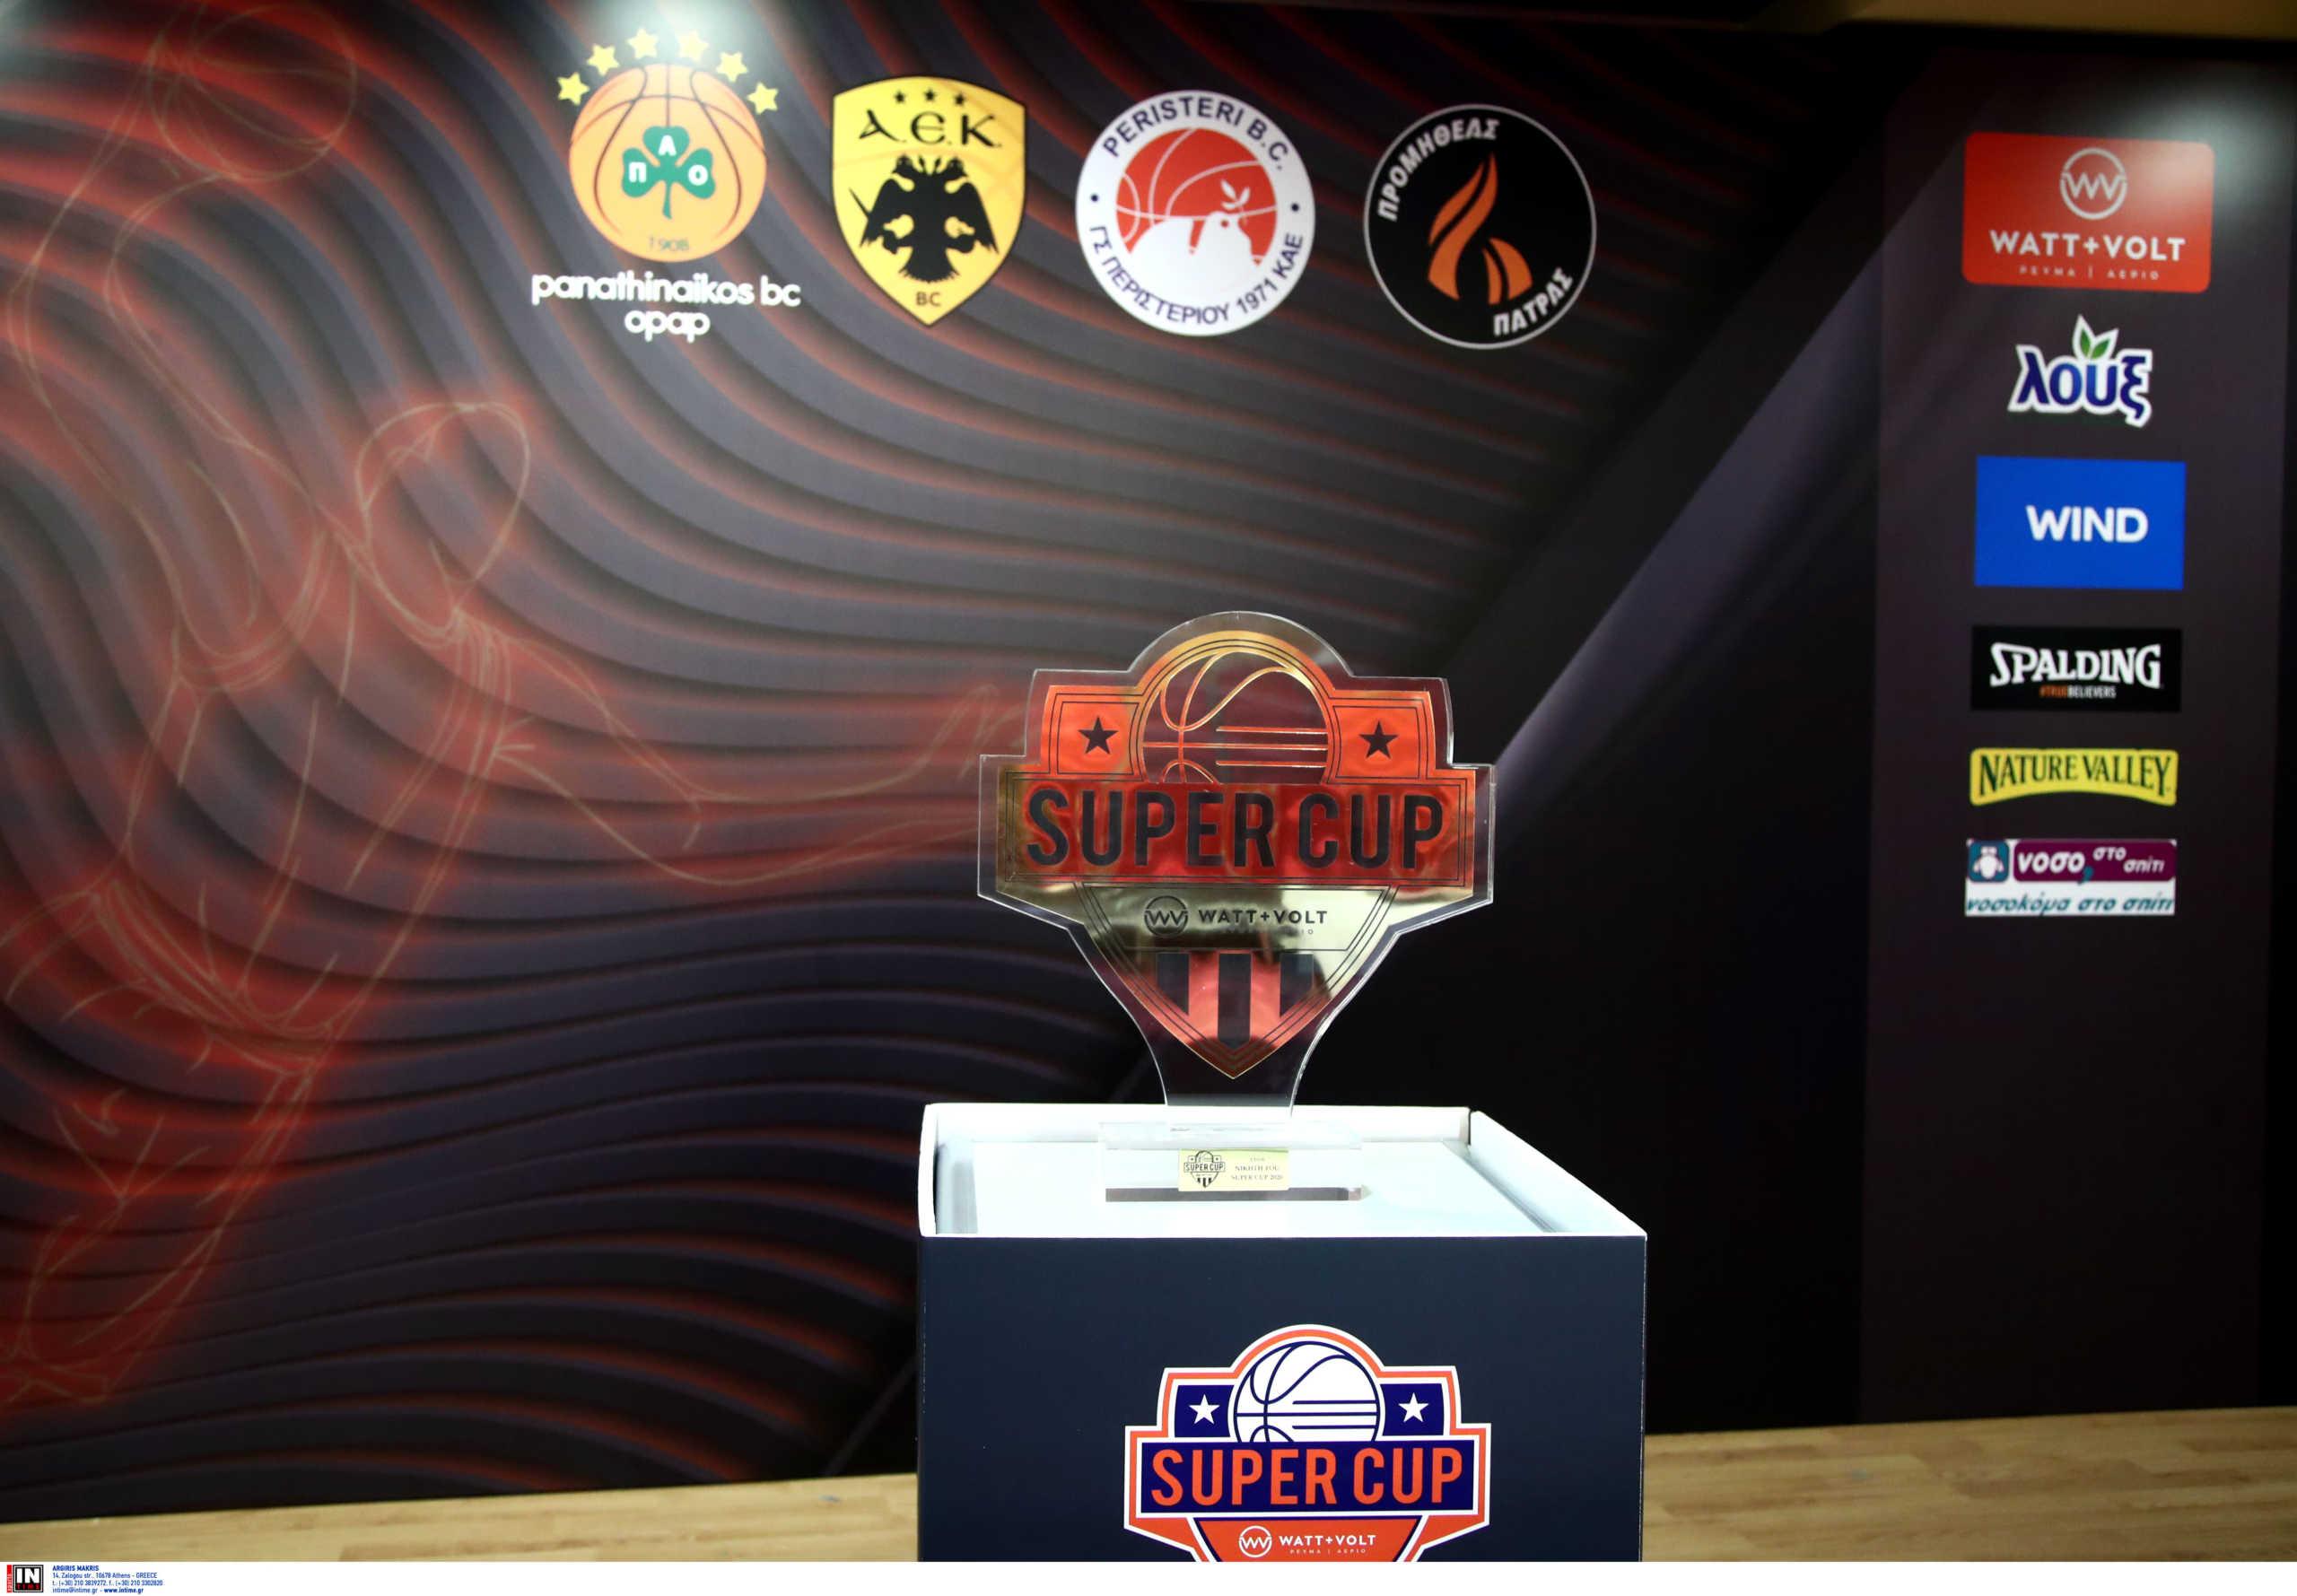 1o Super Cup μπάσκετ: Ανέτοιμοι αλλά ανυπόμονοι δήλωσαν στη συνέντευξη Τύπου οι φιναλίστ